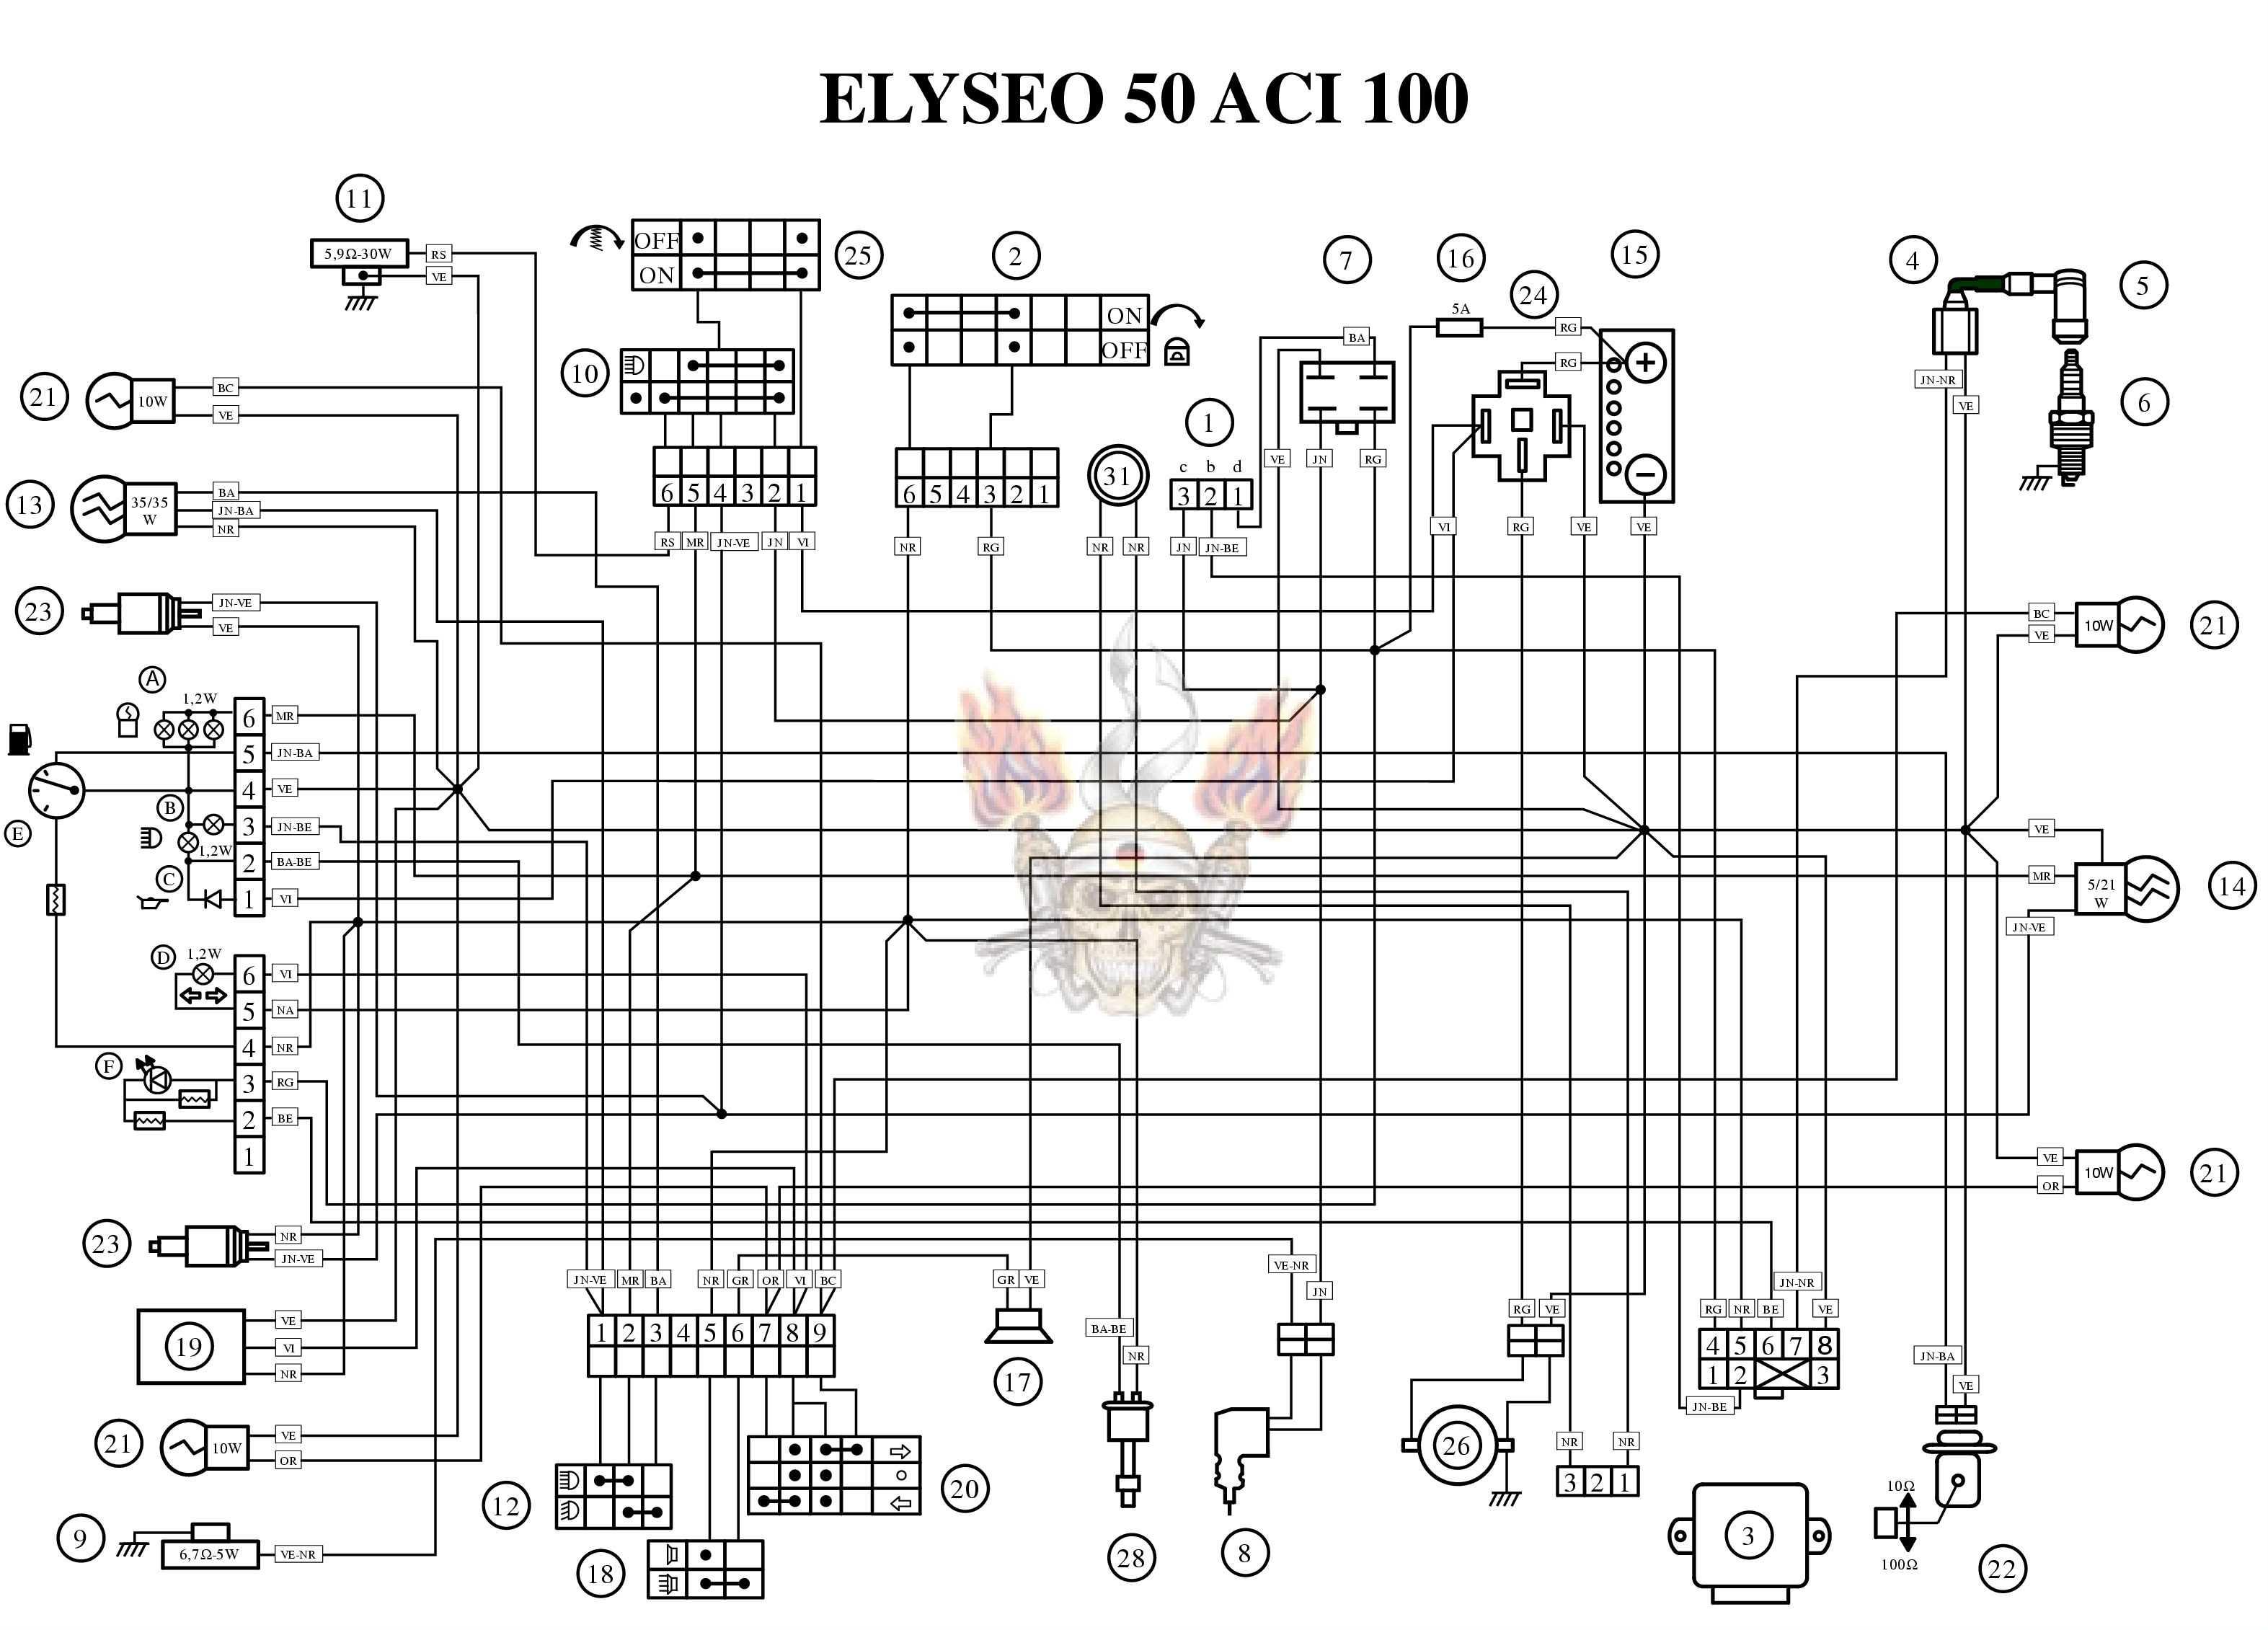 Peugeot 306 Wiring Diagram Schematics Diagrams 206 Immobiliser Vivacity 100 Gti Attractive Download